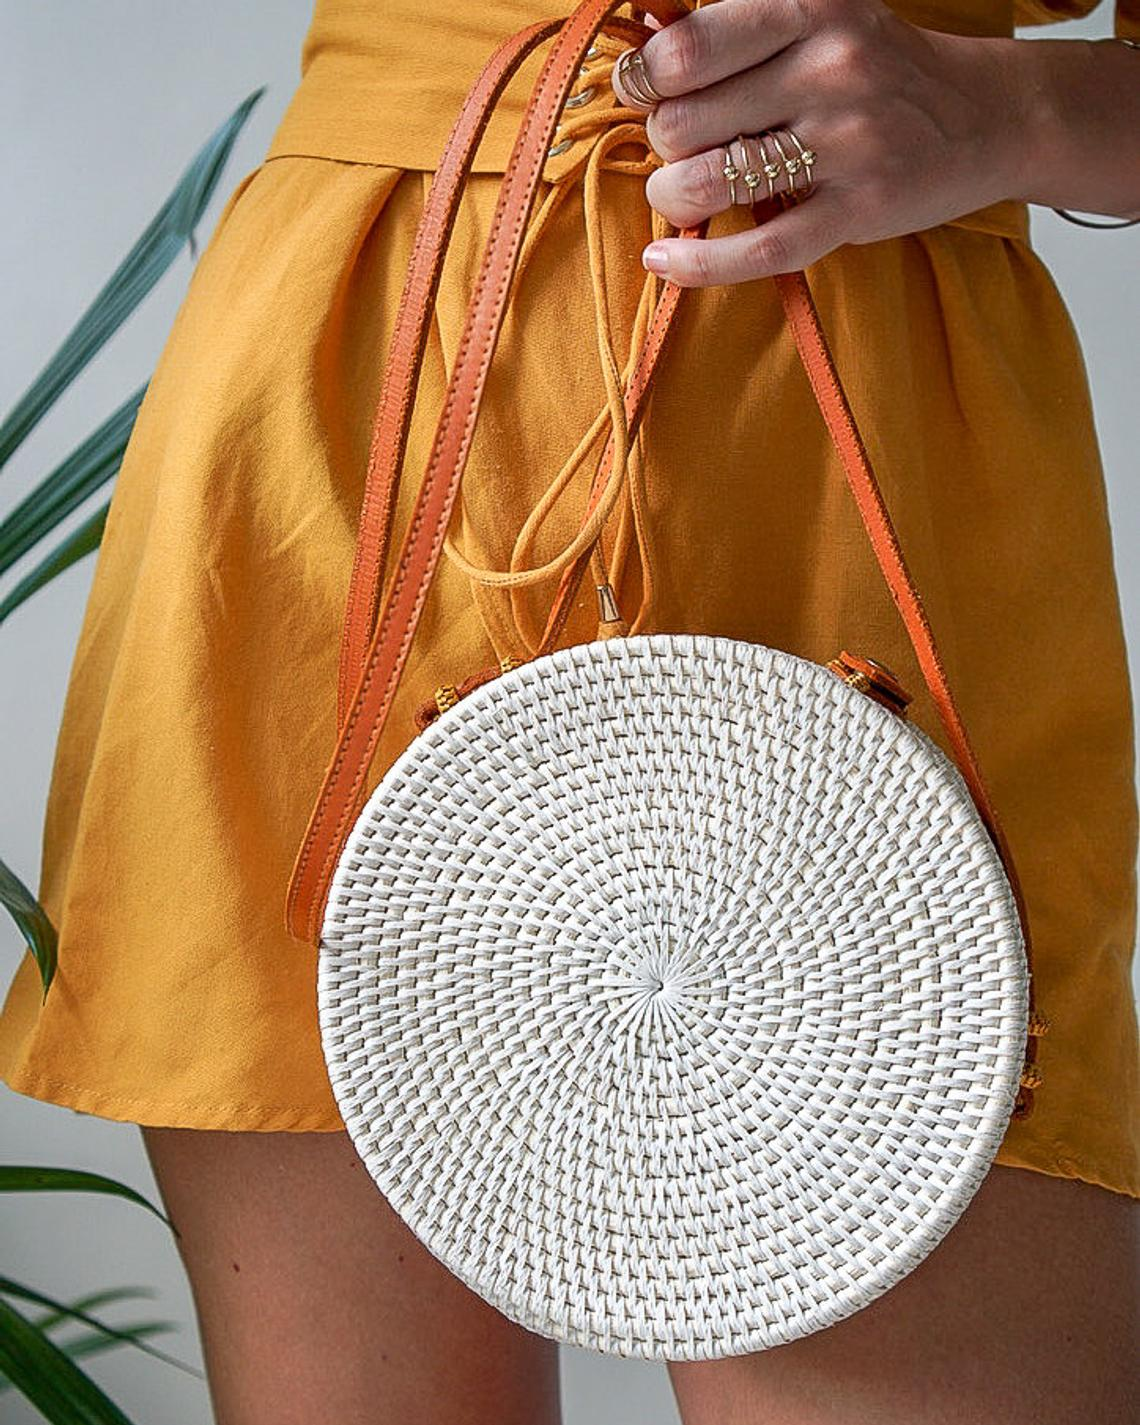 Round Bali Rattan Bag with Tassels By KaimanaShop